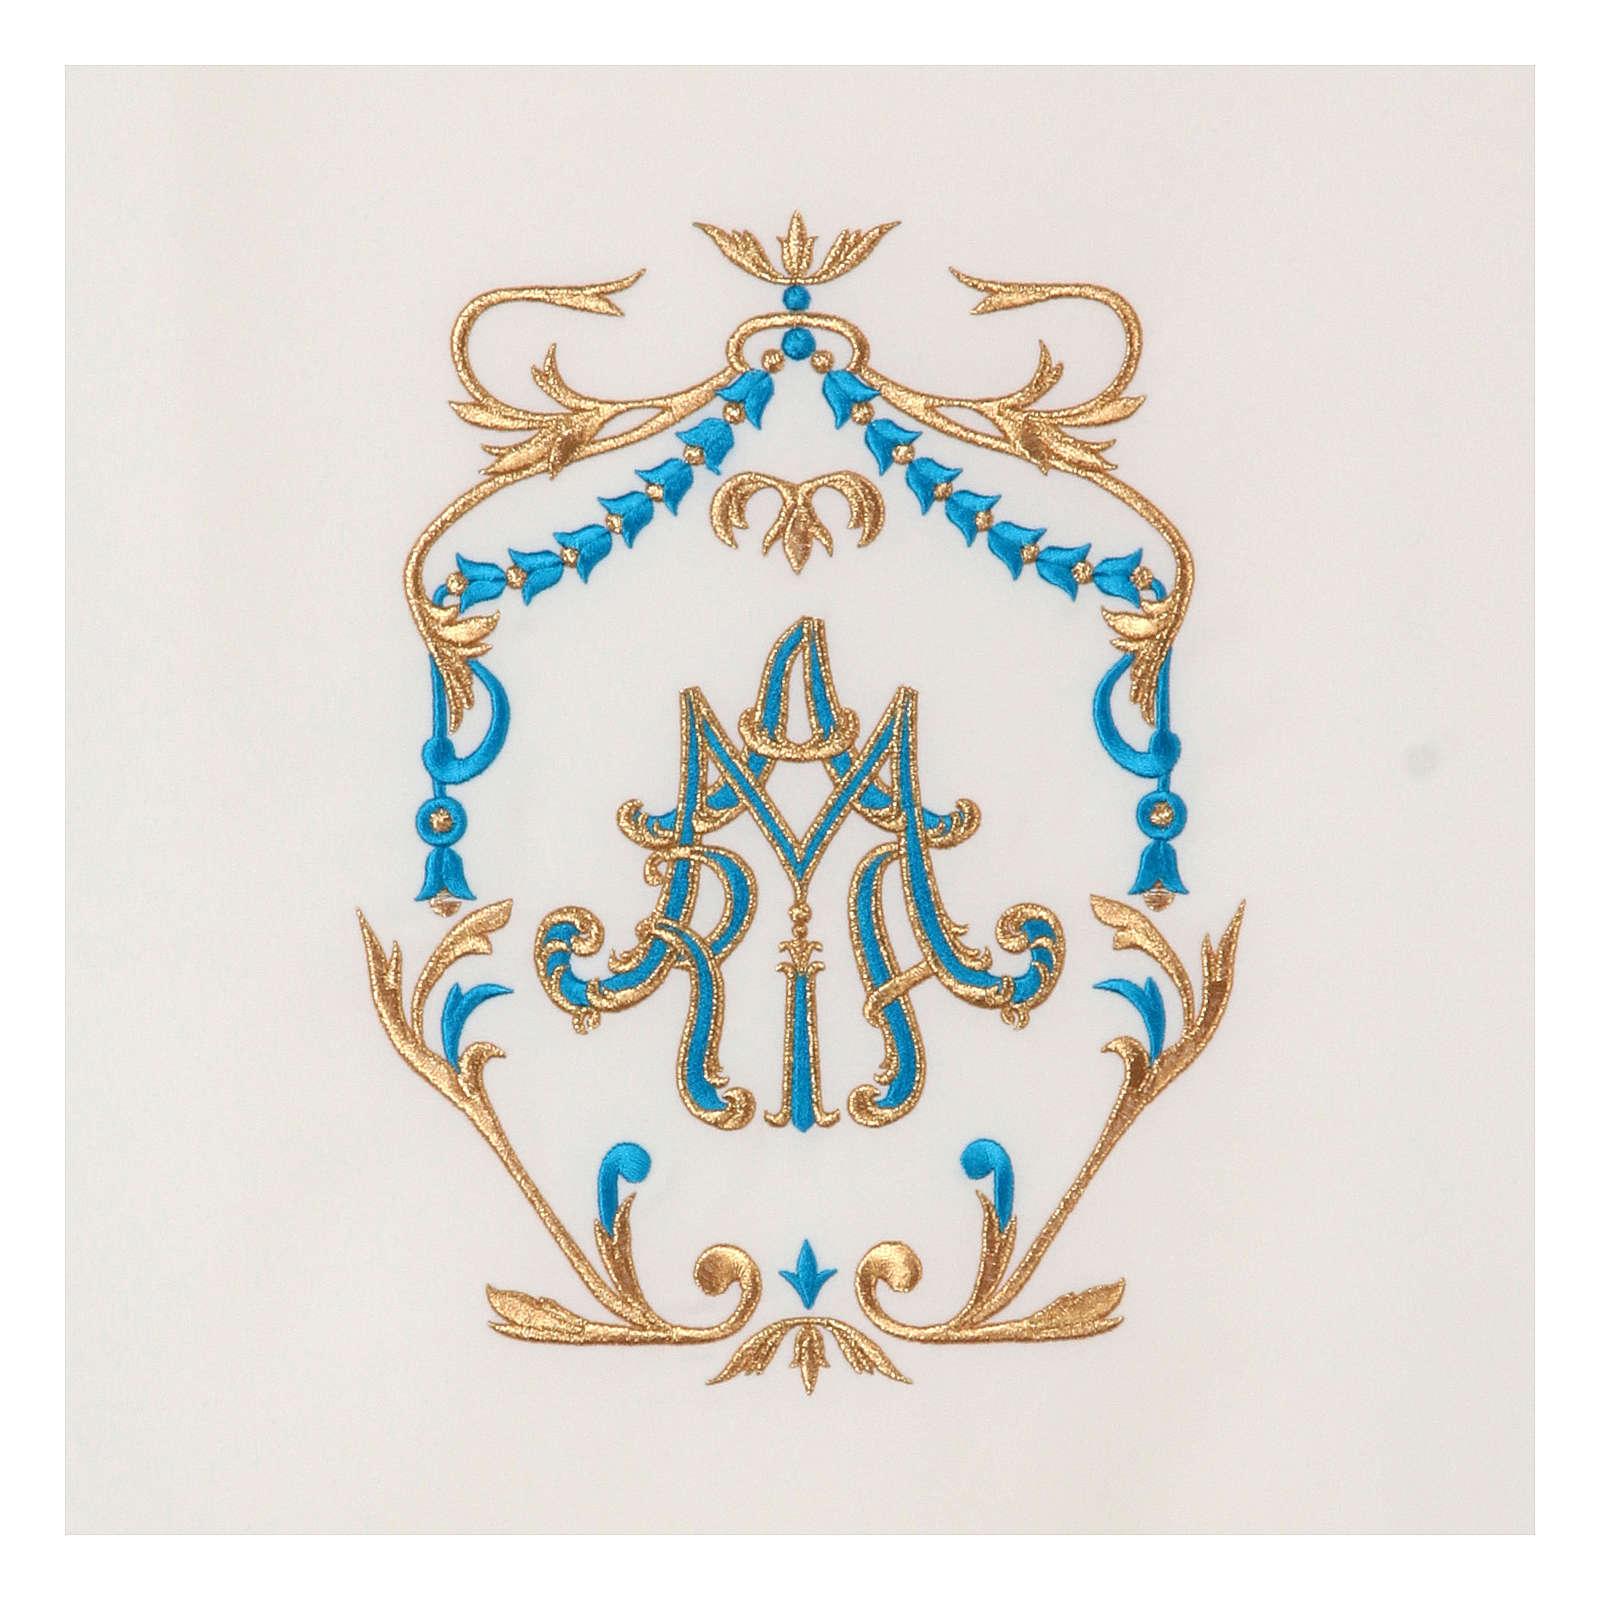 Paño de atril bordados oro y azul Santísimo Nombre de María 4